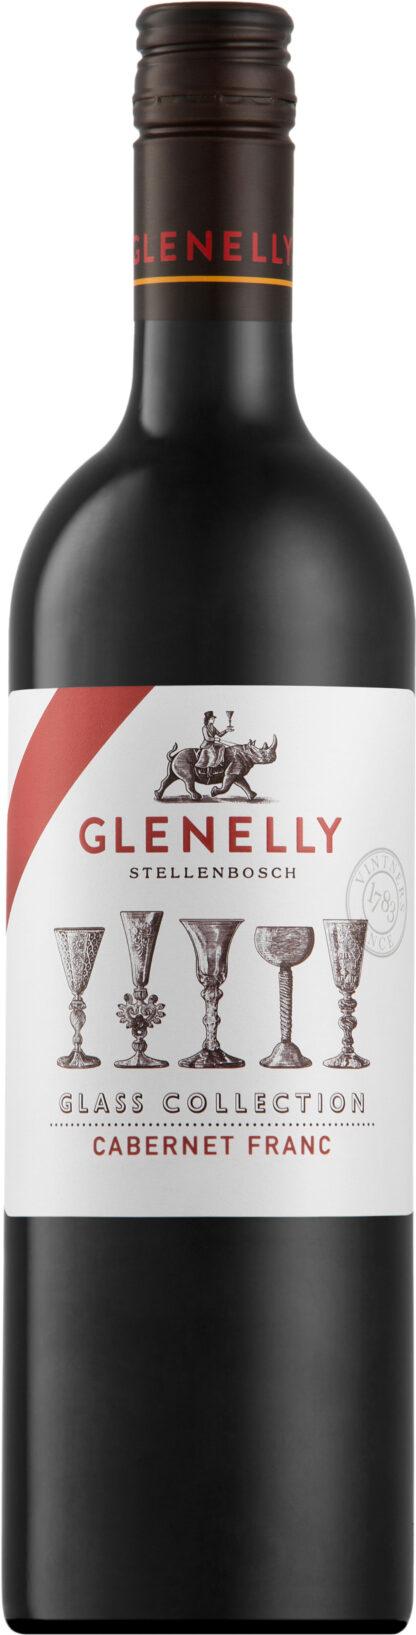 Glenelly - Glass Collection Cabernet Franc 2017 75cl Bottle